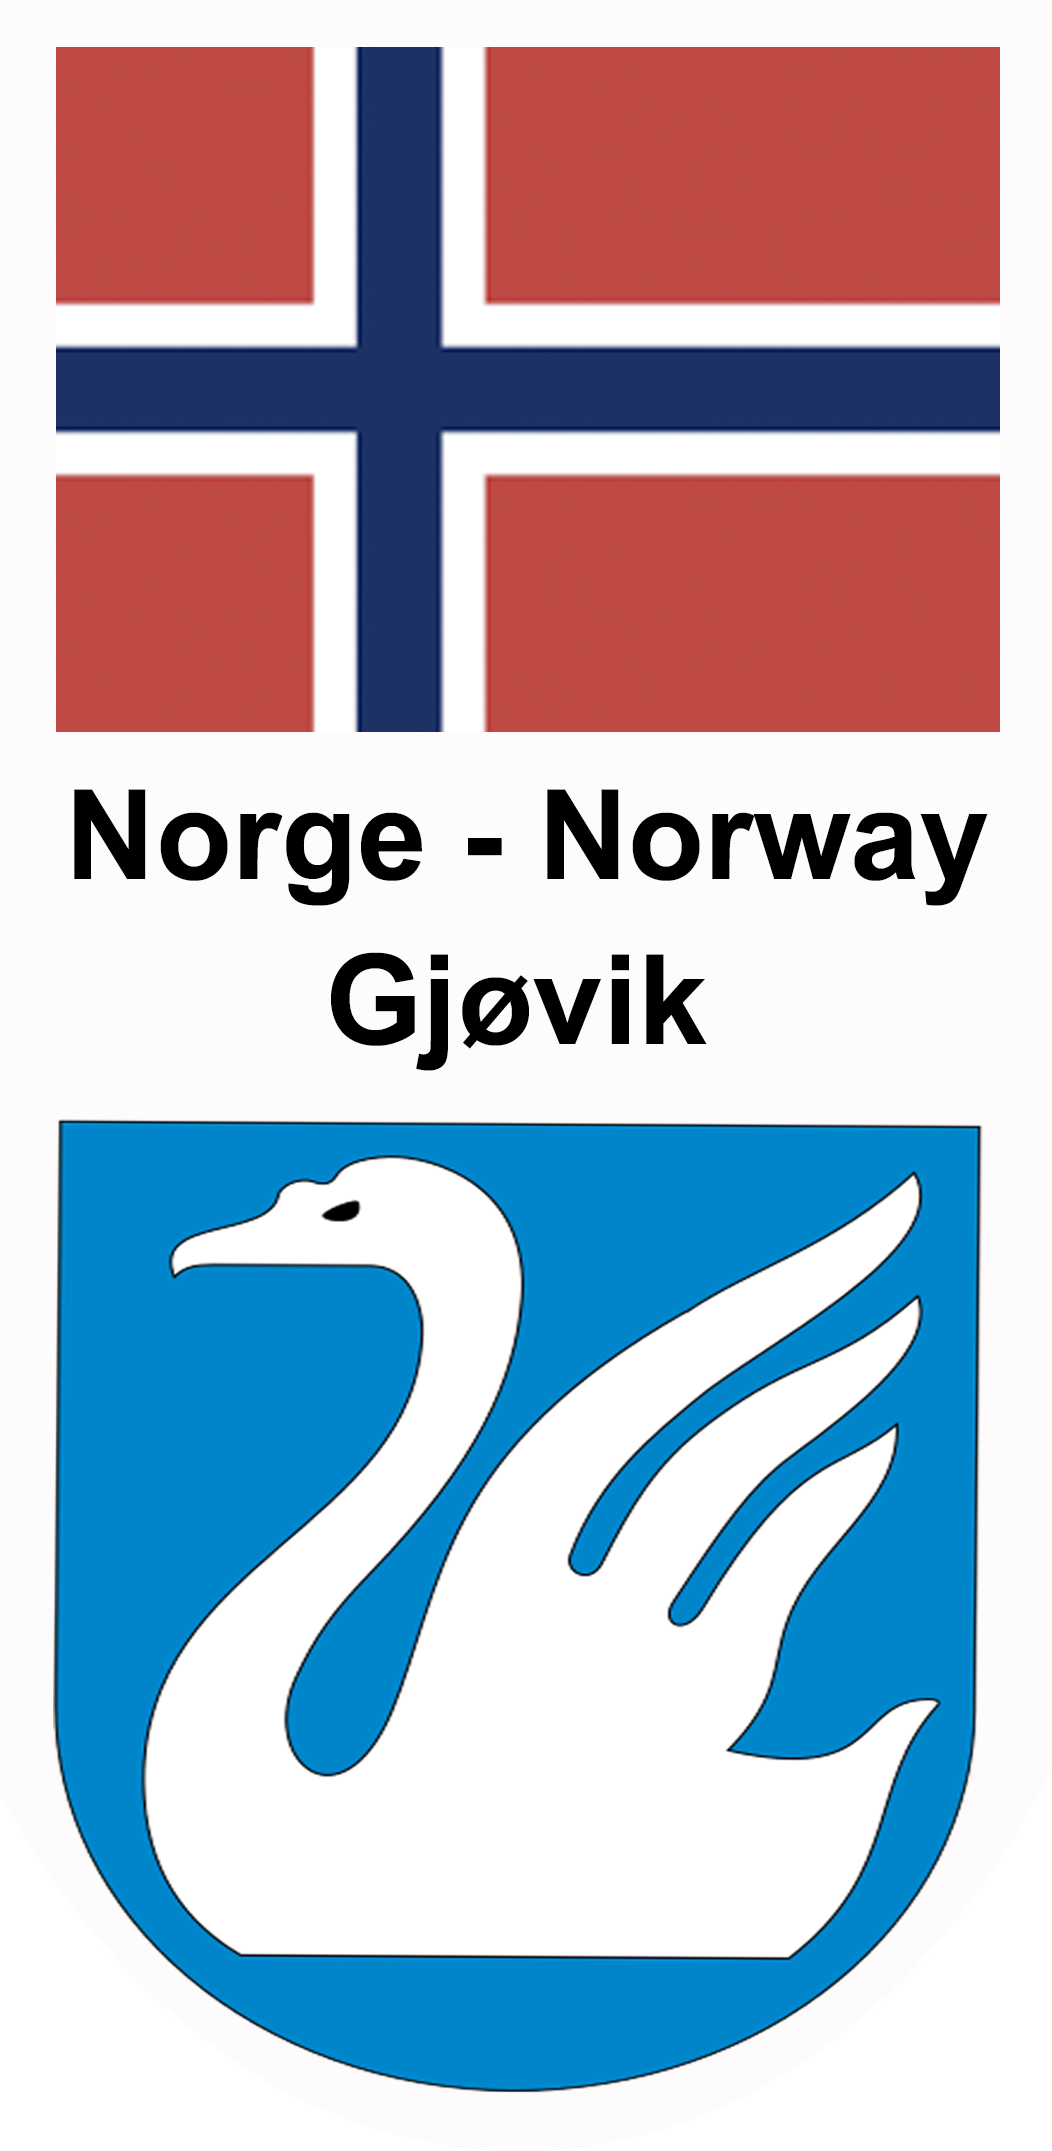 Norge/ Gjøvik pins design